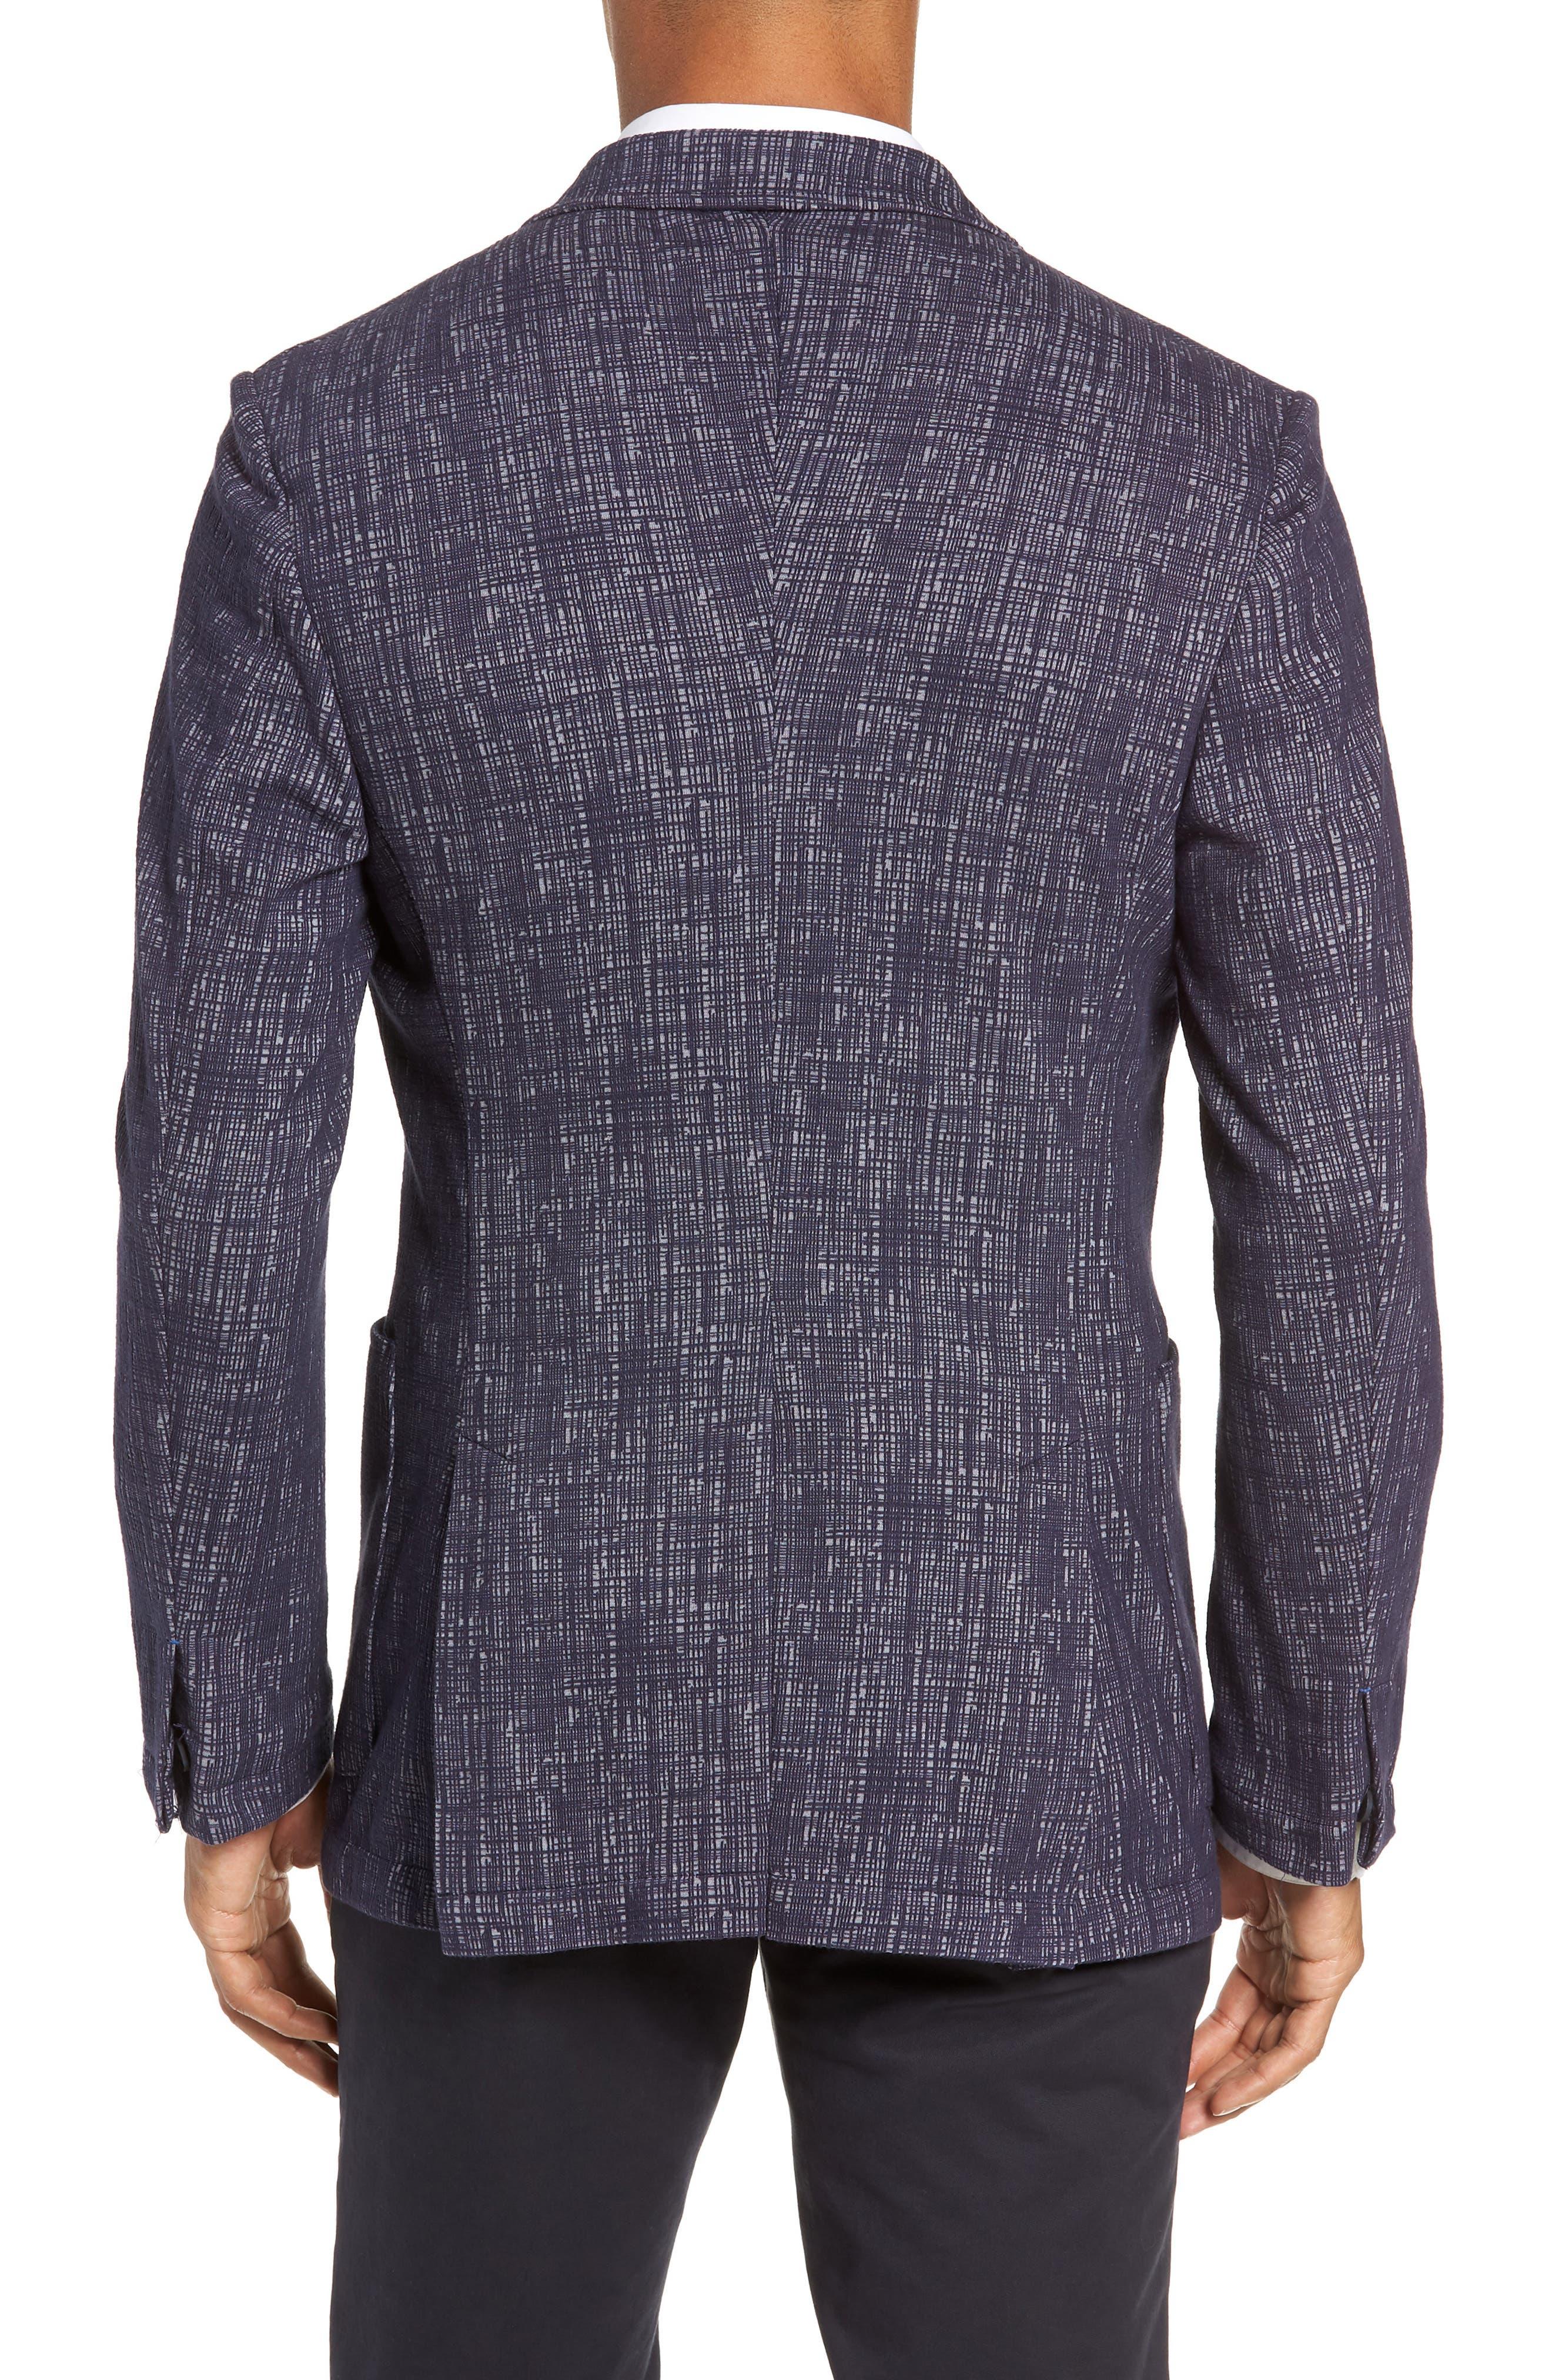 VINCE CAMUTO,                             Mesh Pattern Slim Fit Sport Coat,                             Alternate thumbnail 2, color,                             BLUE